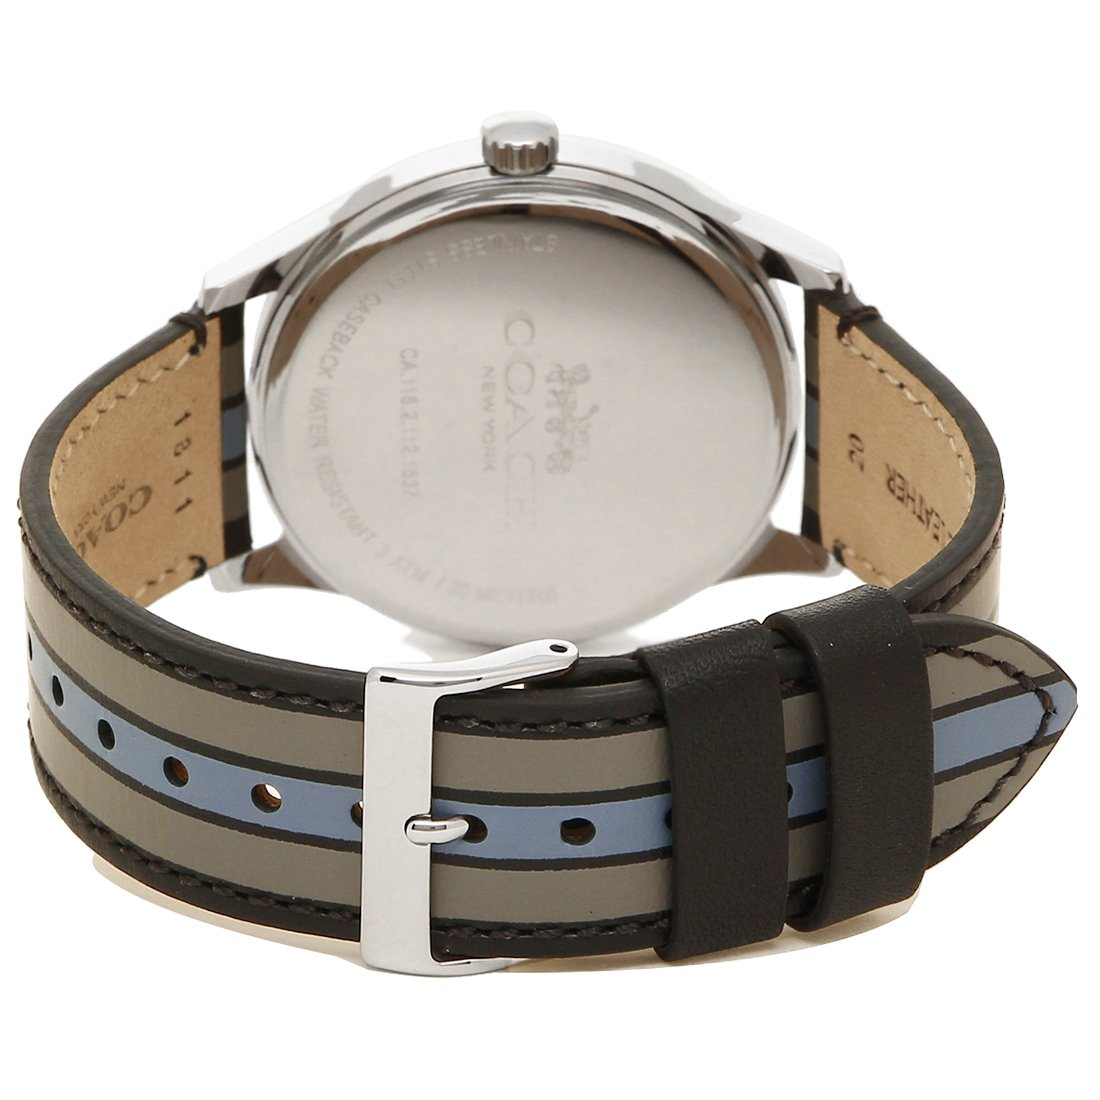 461cac5c0336 Amazon | [コーチ] 腕時計 メンズ アウトレット COACH W1545 D9B シルバー ブラック グレー [並行輸入品] |  並行輸入品・逆輸入品・中古品(メンズ) | 腕時計 通販